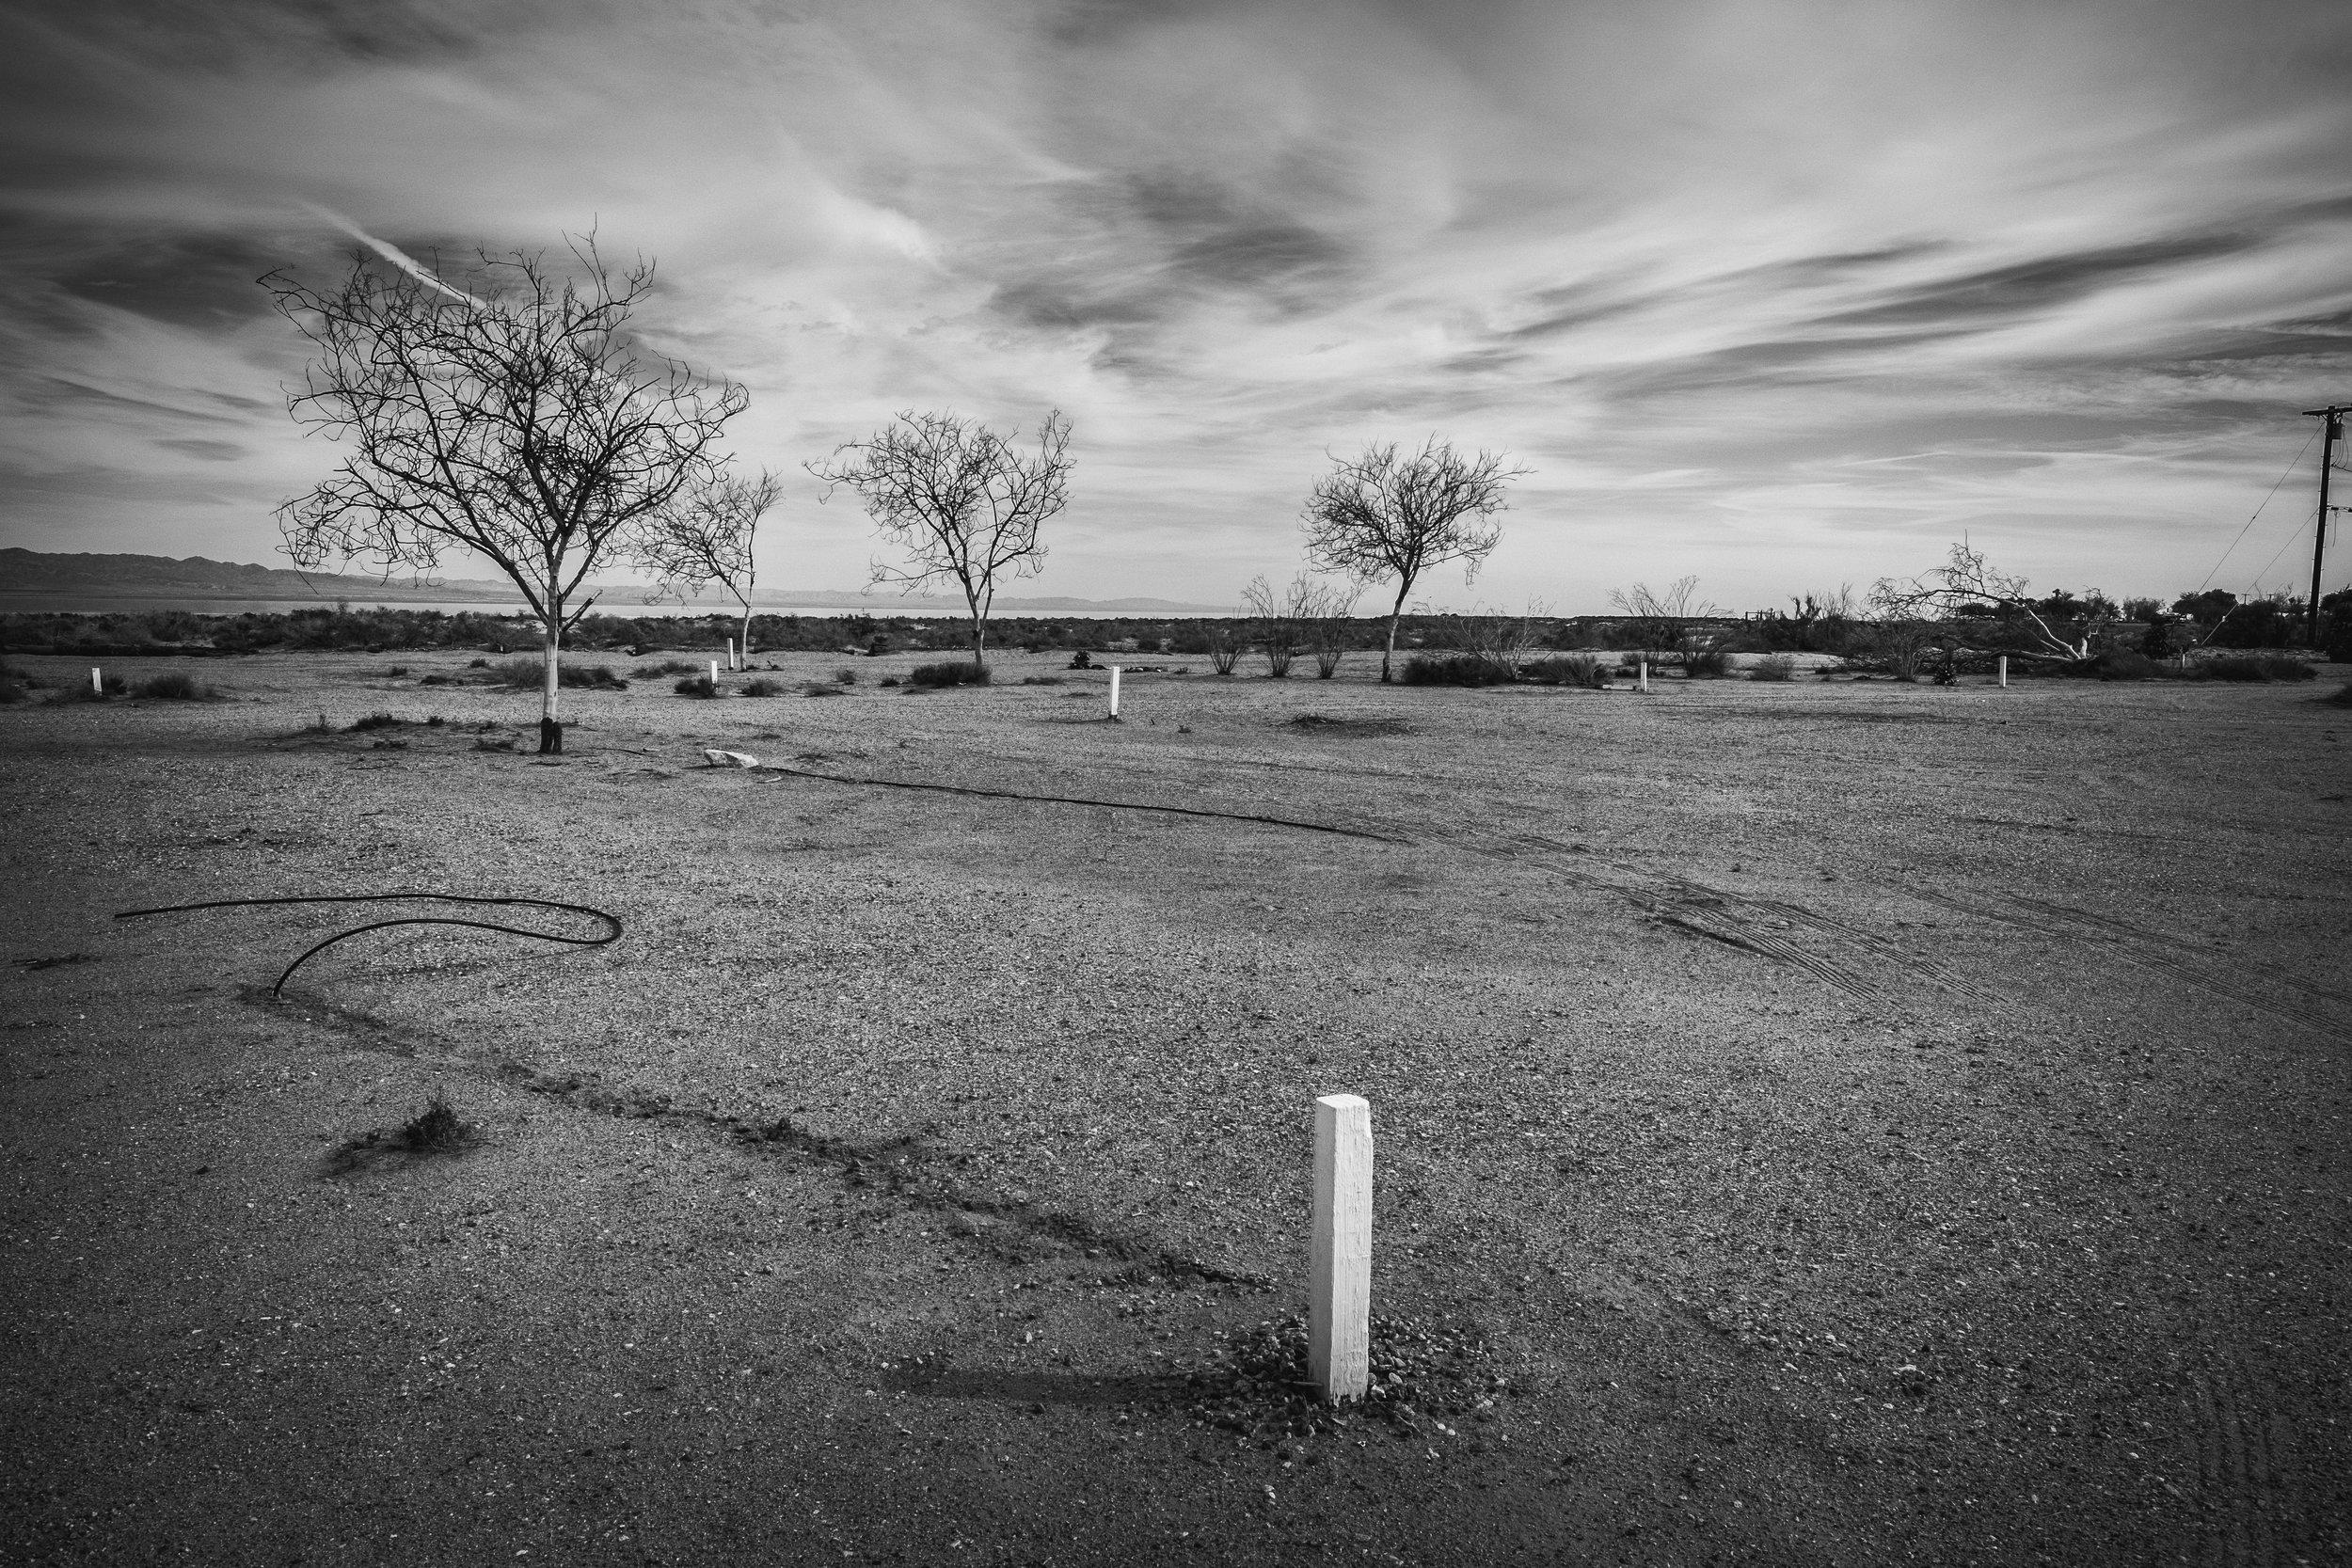 Salton City. 1/350 @ f11, ISO 200